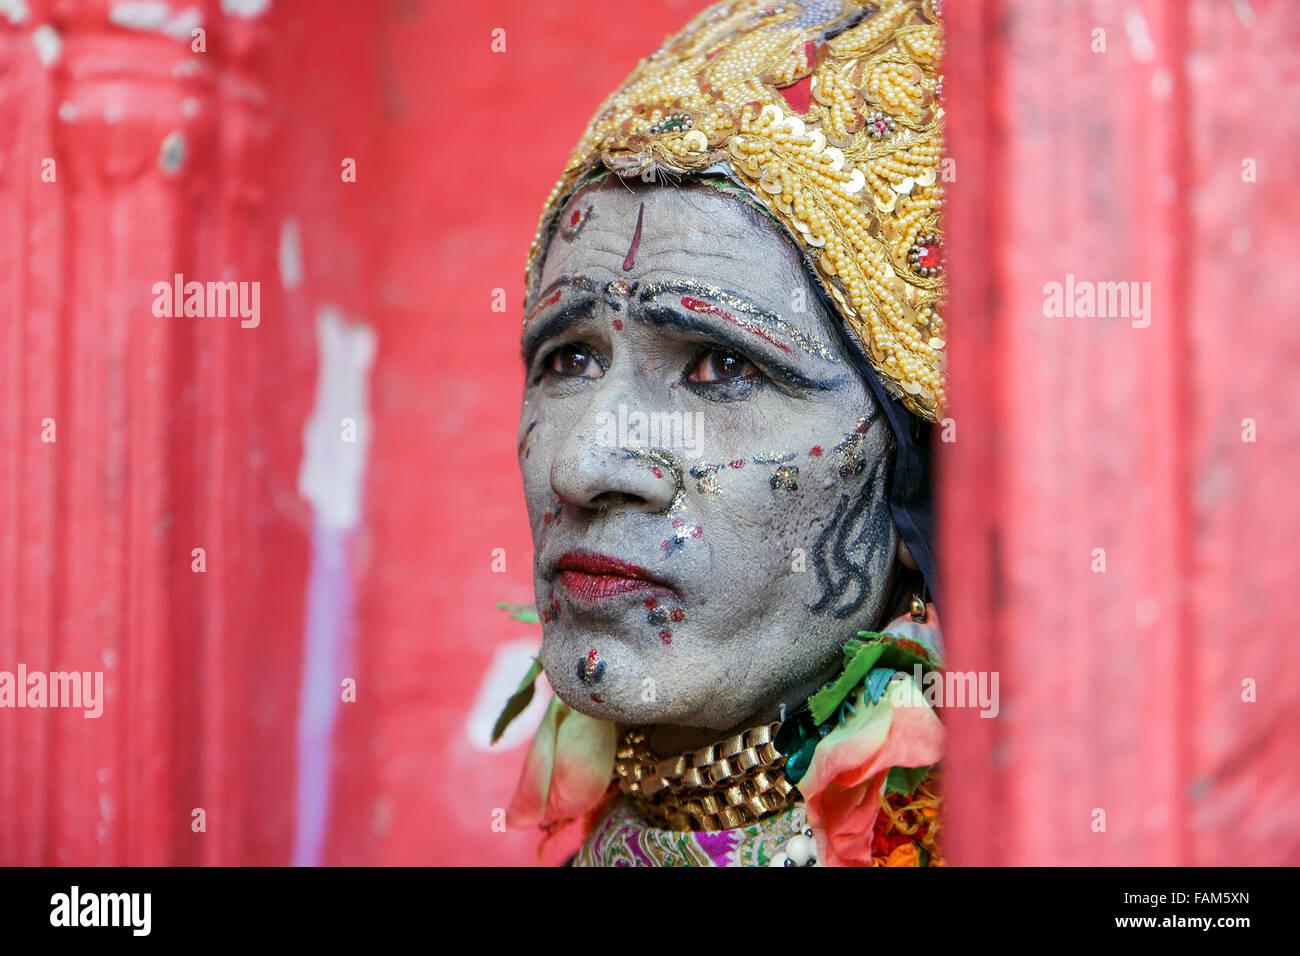 An unidentified local Sadhu during Pushkar Fair in Pushkar, Rajasthan, India. - Stock Image